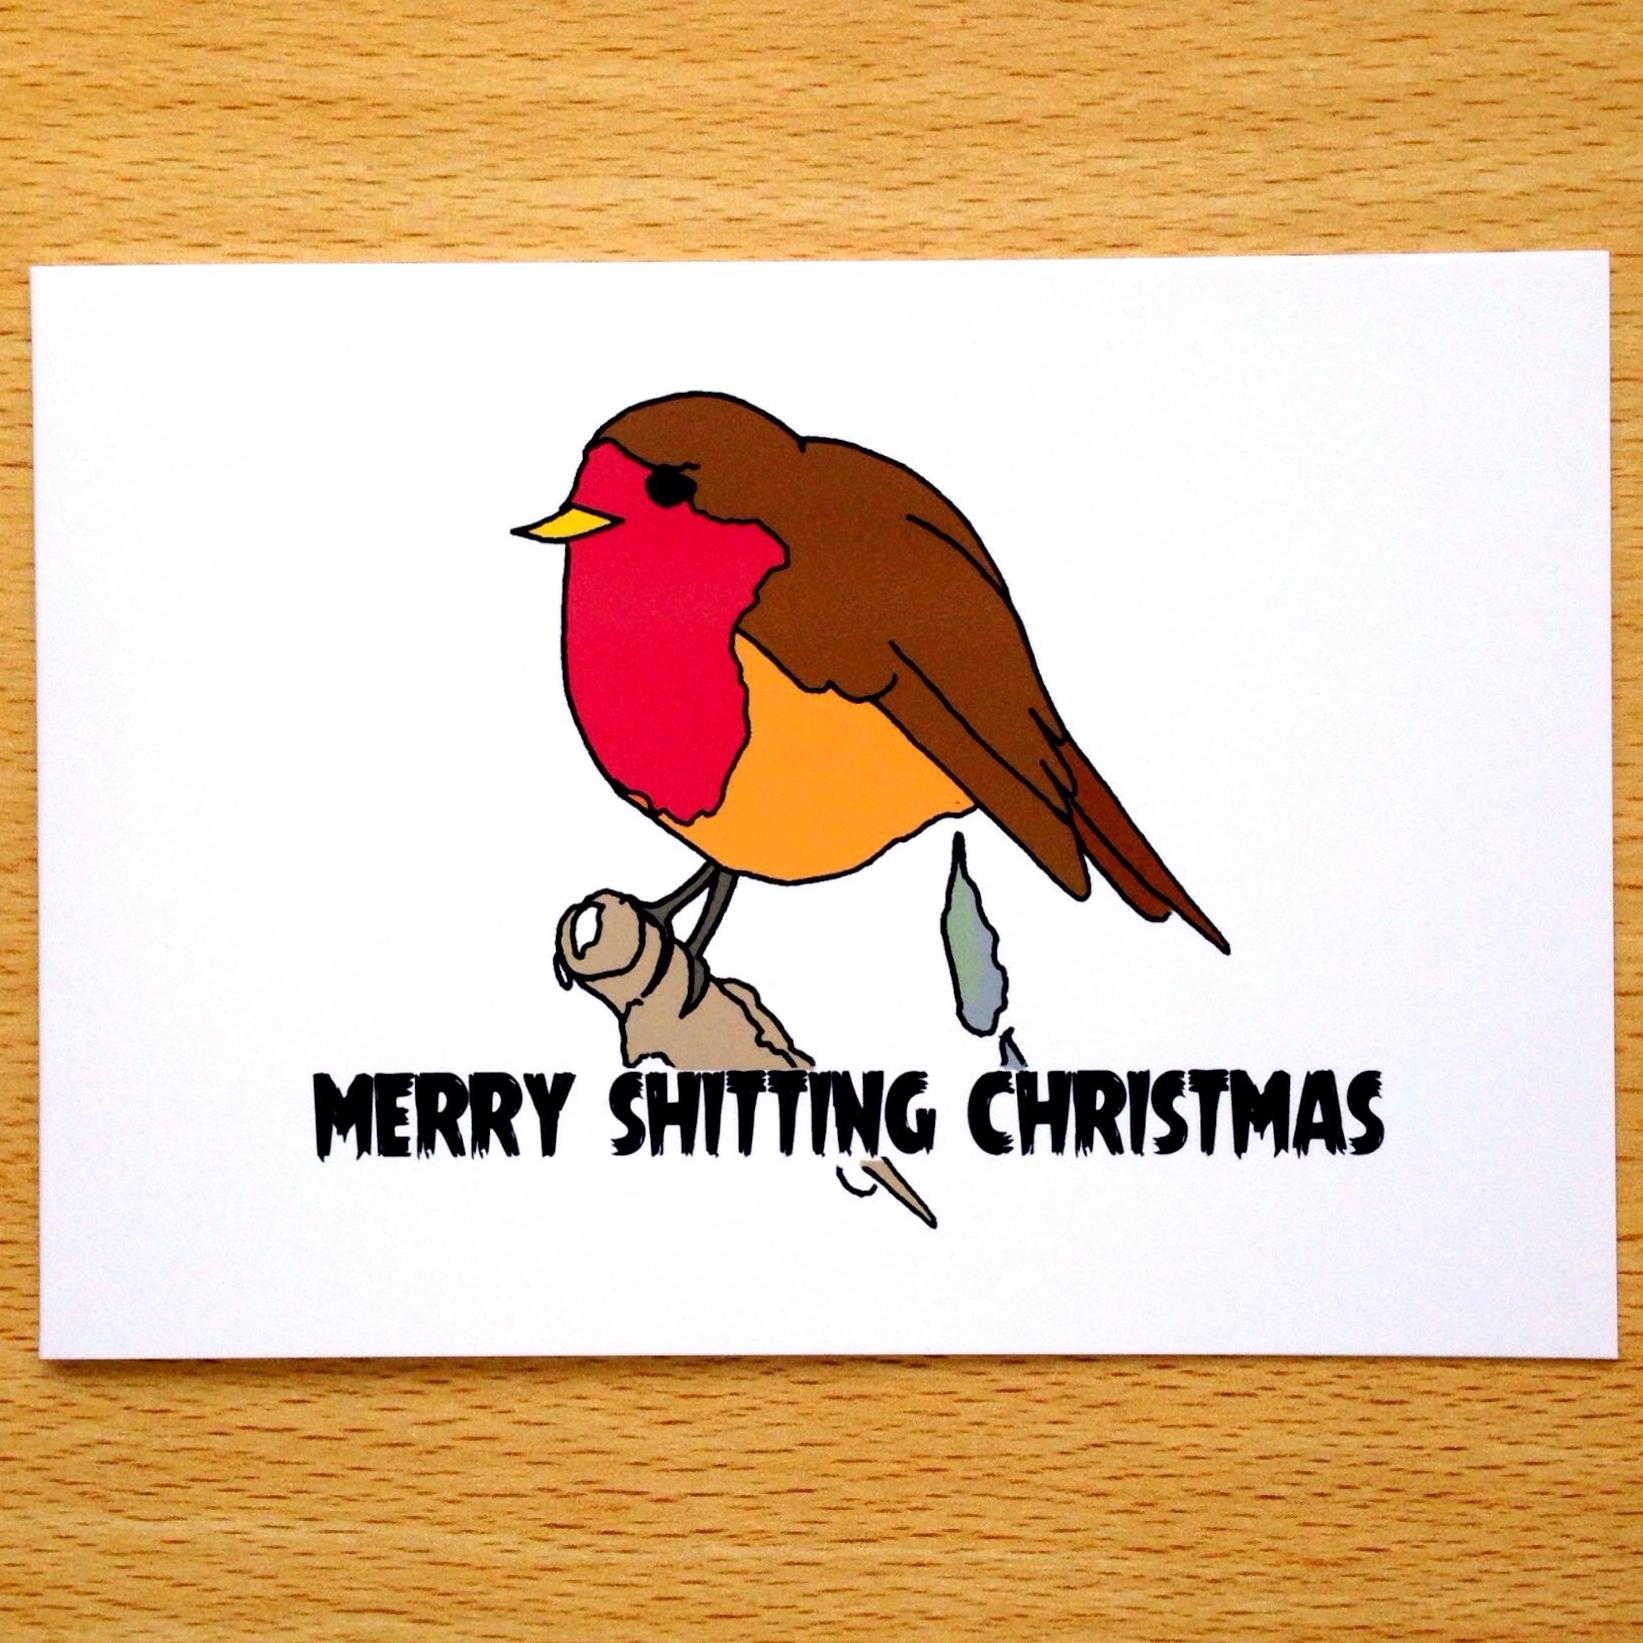 Merry Shitting Christmas